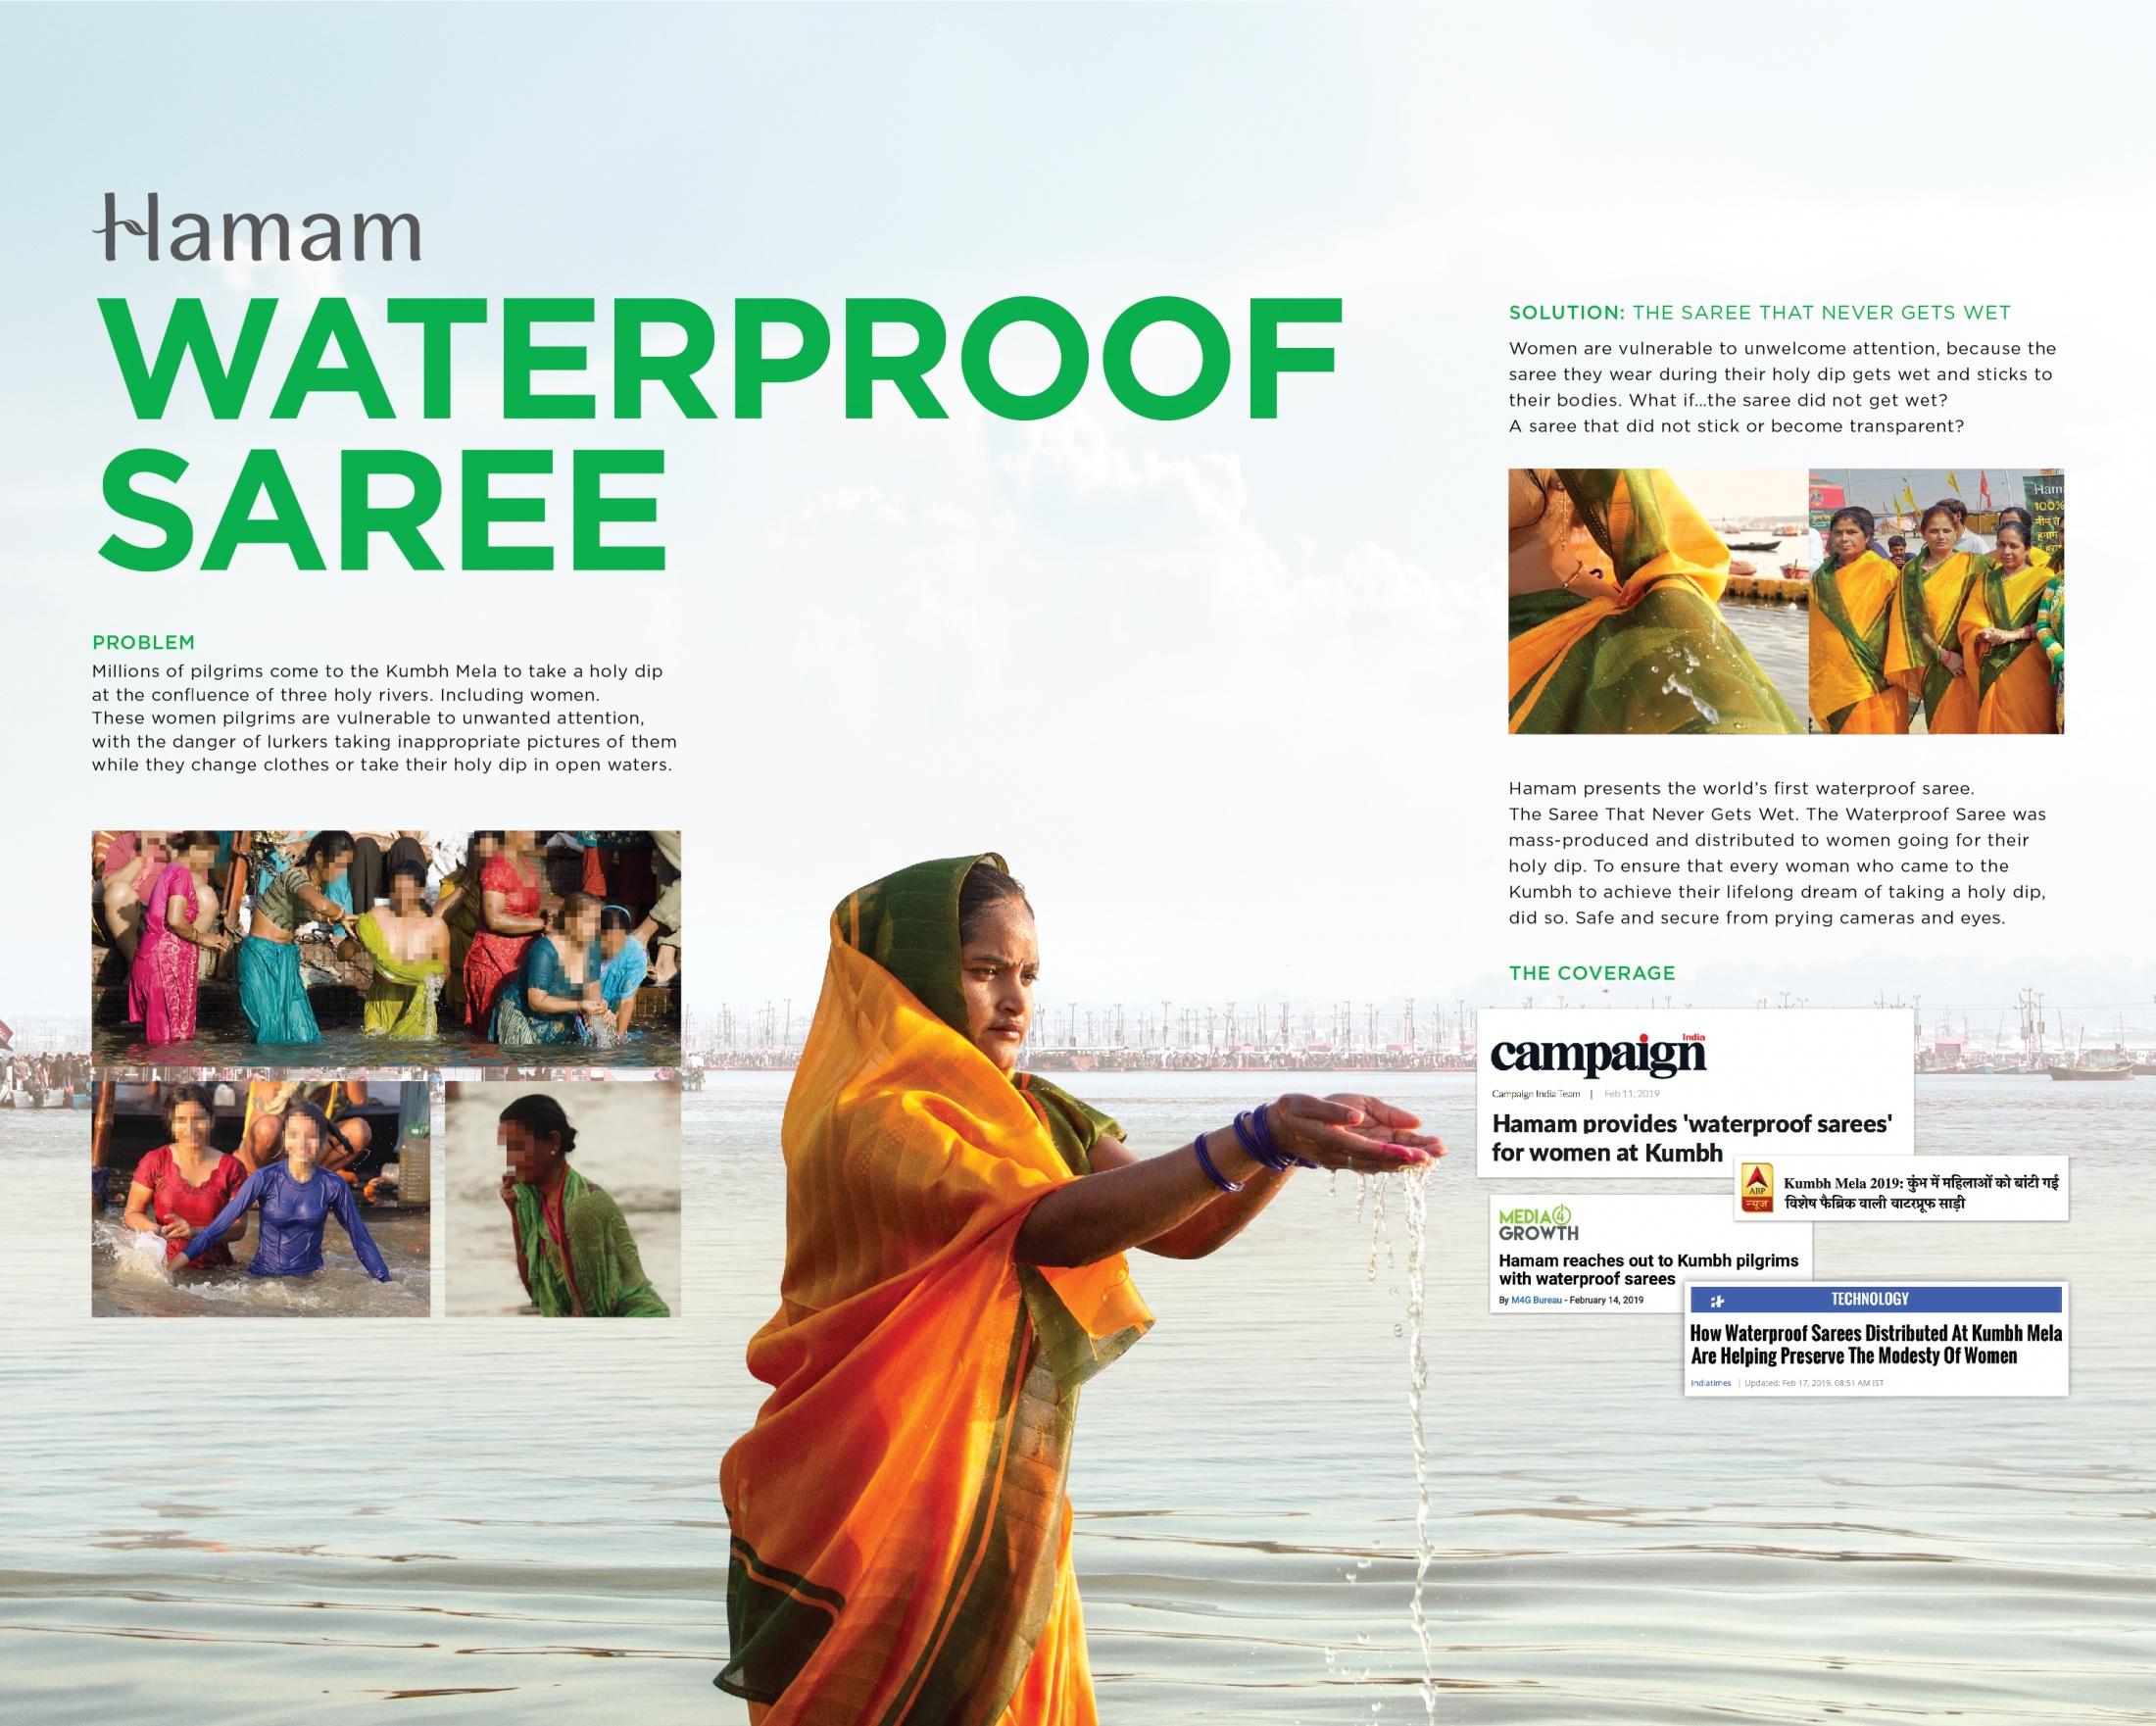 Thumbnail for The Waterproof Saree